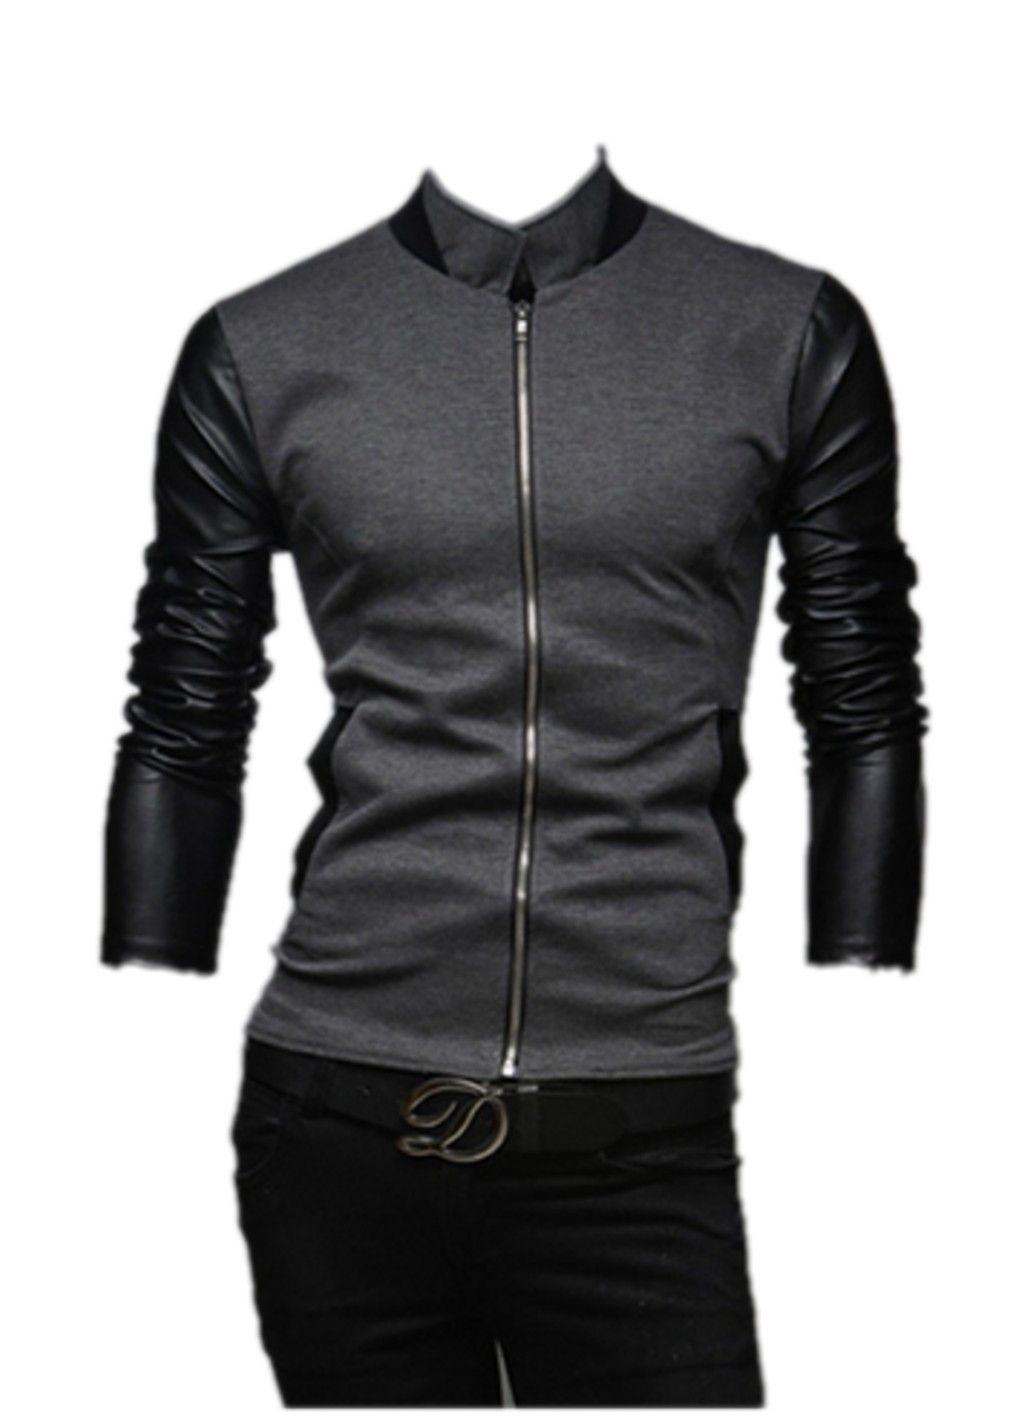 QualityUC Mens American Clothes Fashion Zipper Lightweight Jacket